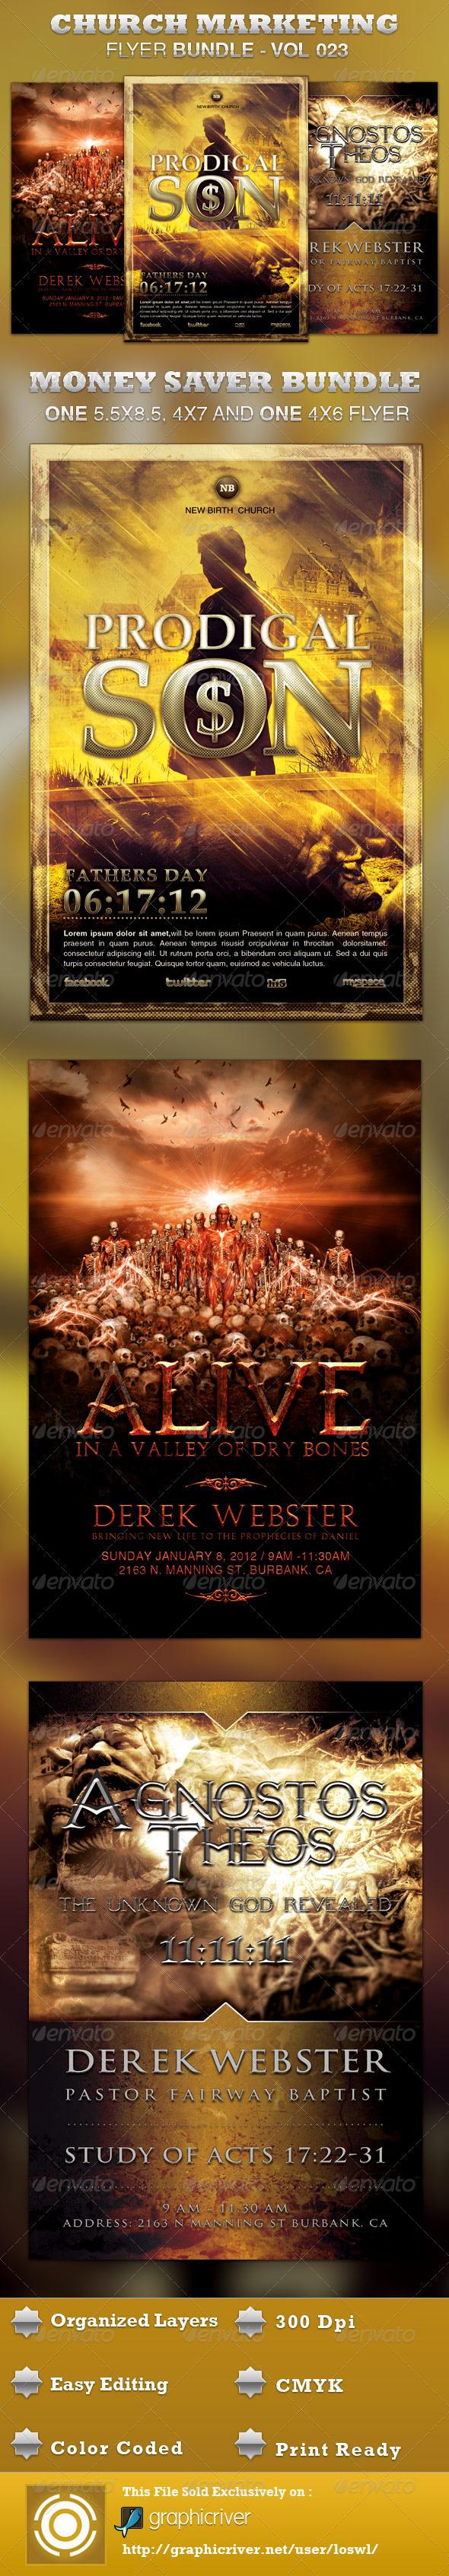 GraphicRiver Church Marketing Flyer Bundle-Vol 023 3863341